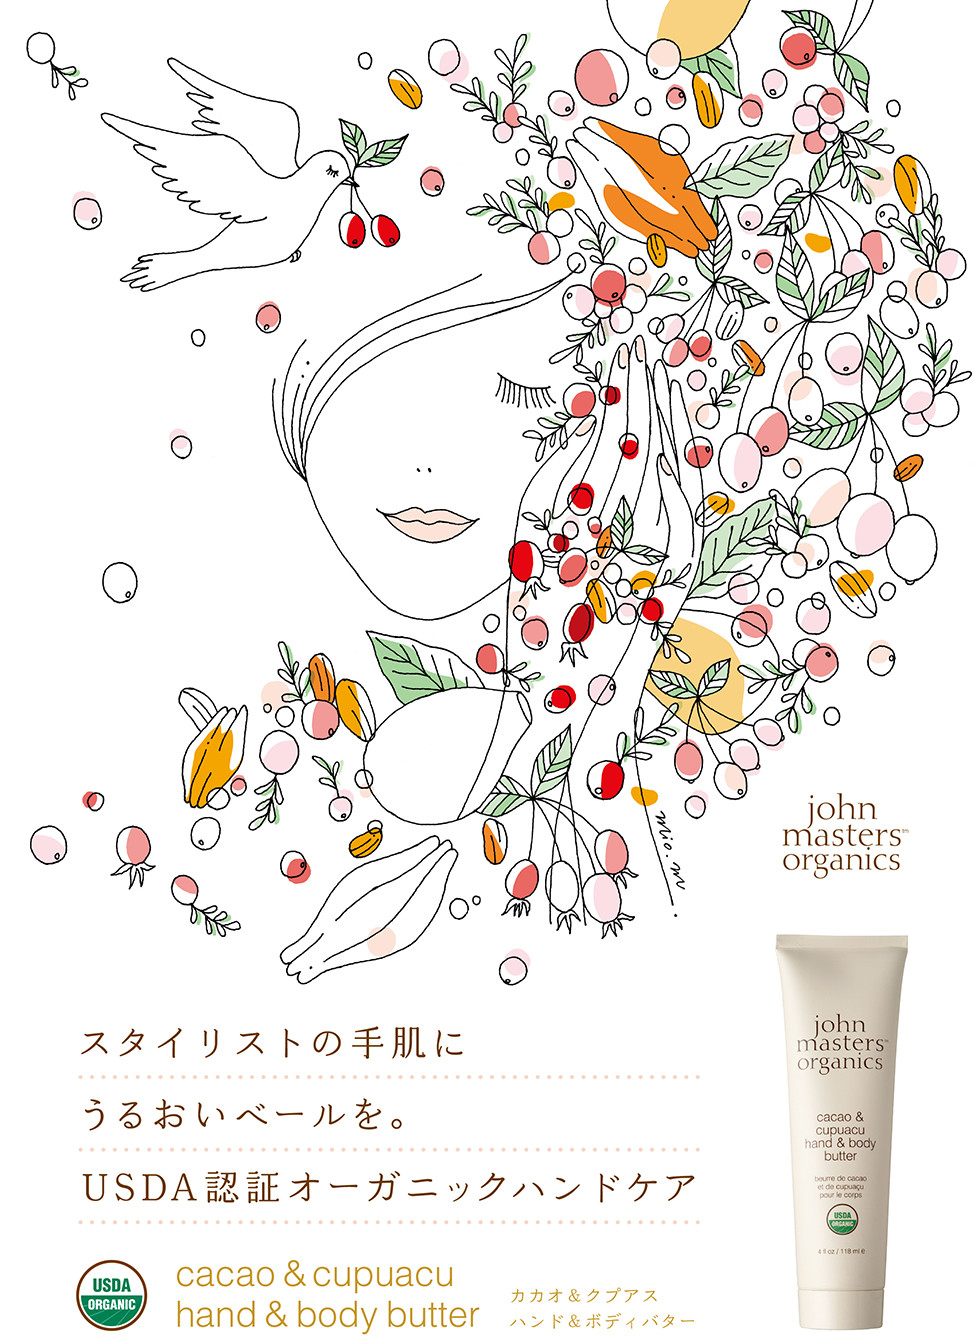 john masters organics Advertisement | mio.matsumoto